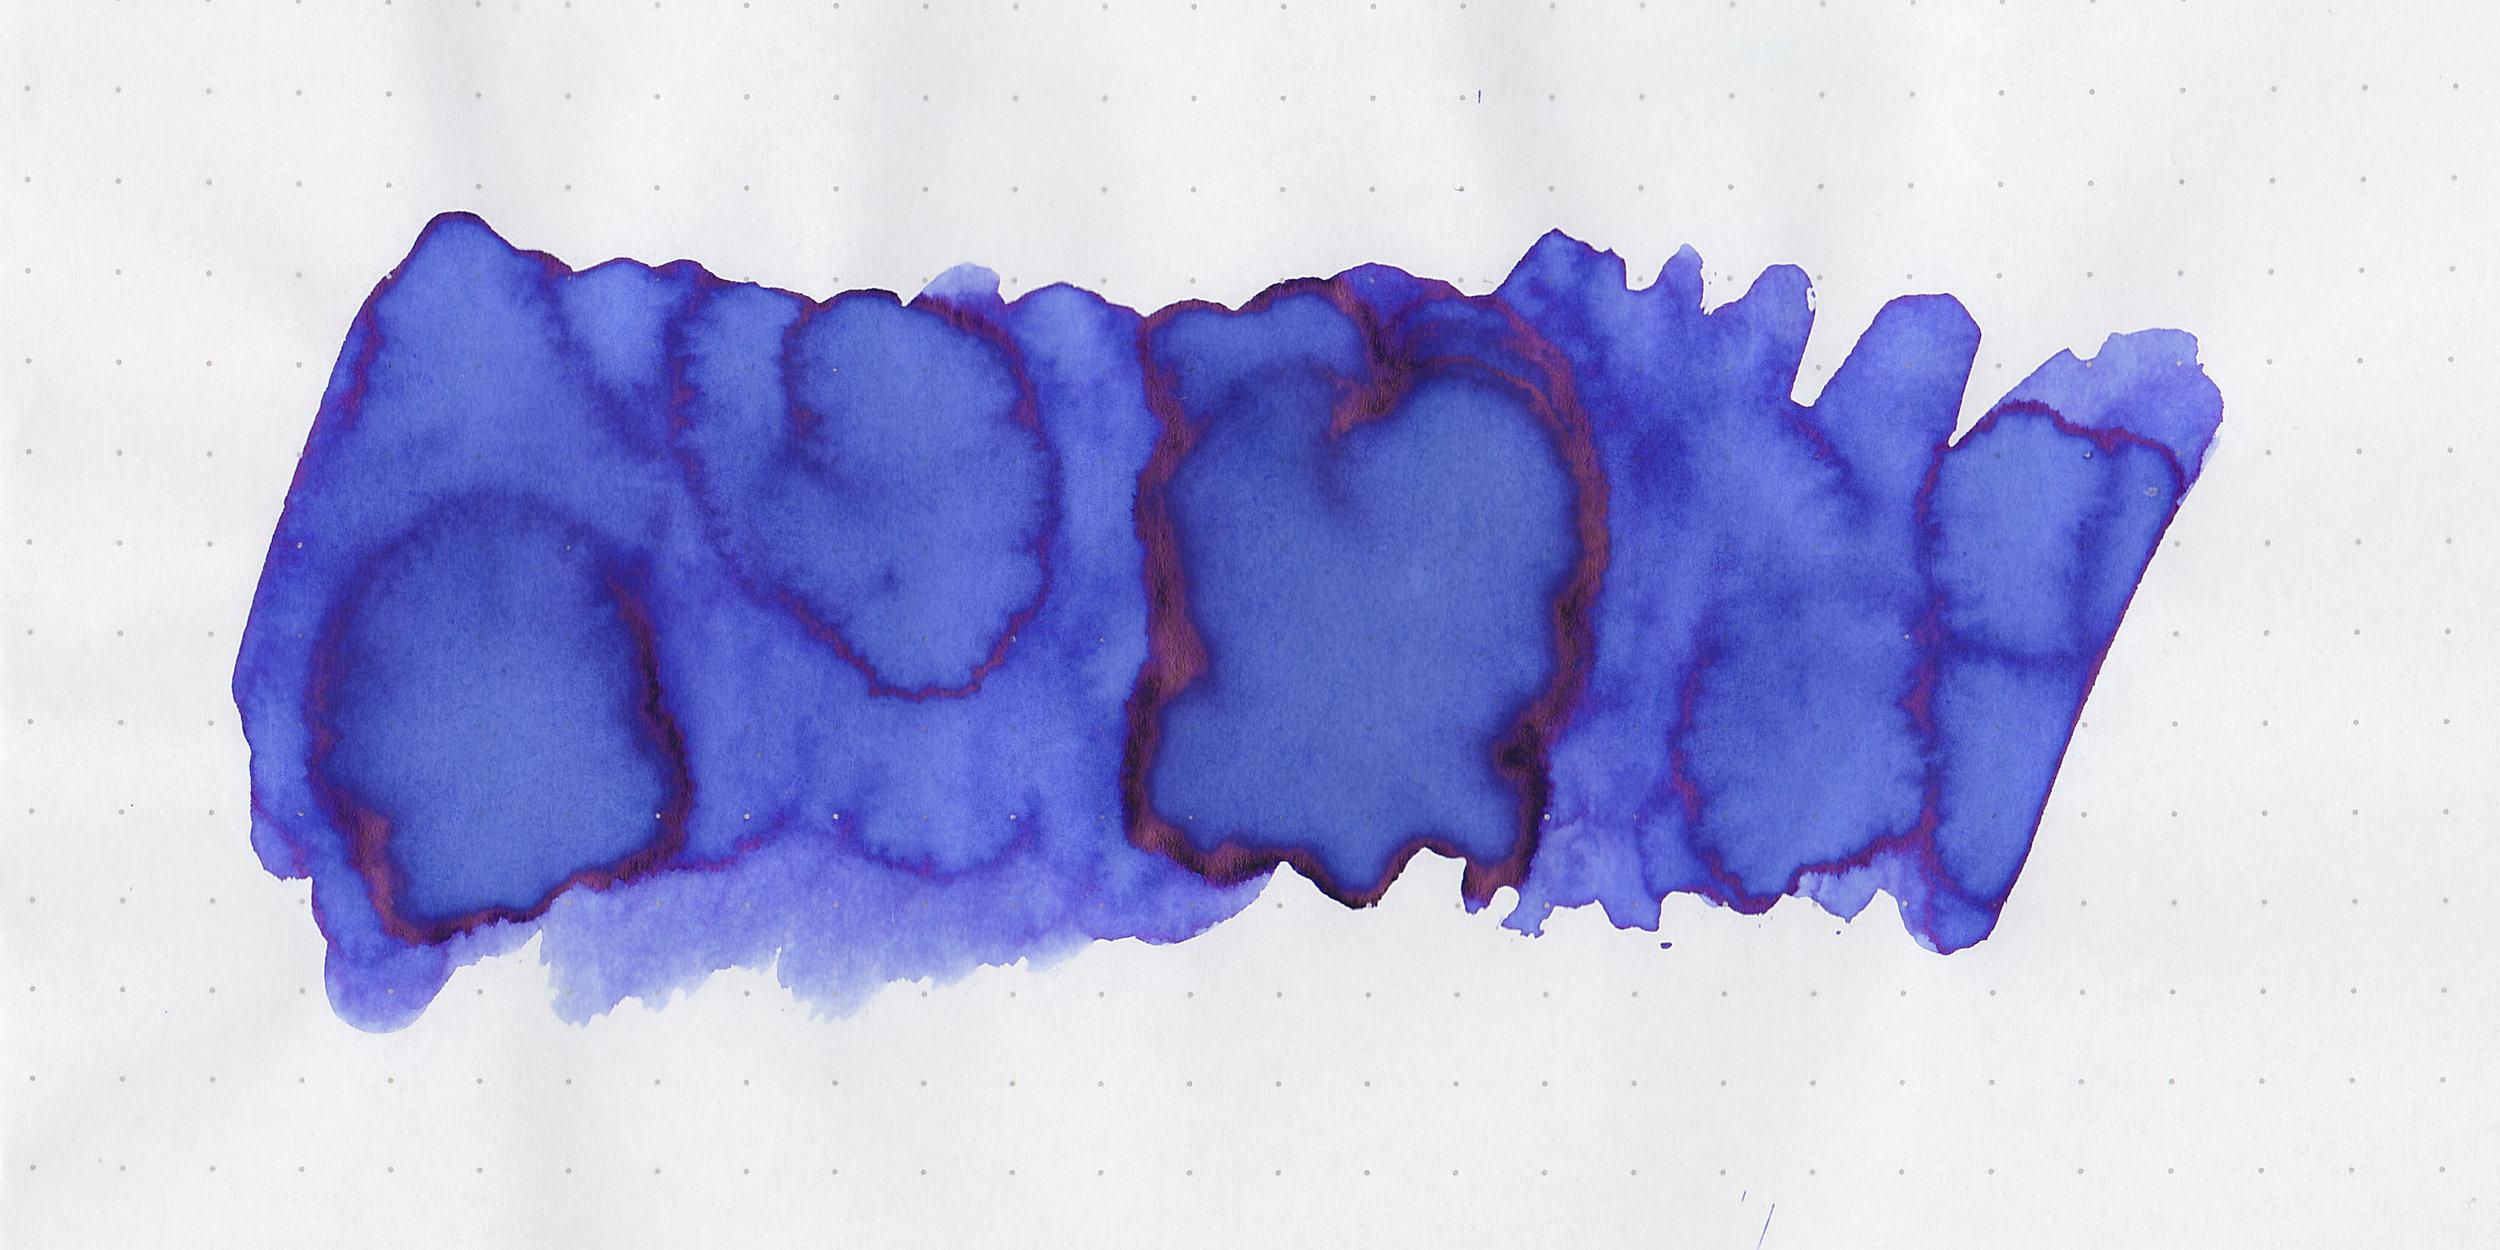 css-blue-3.jpg